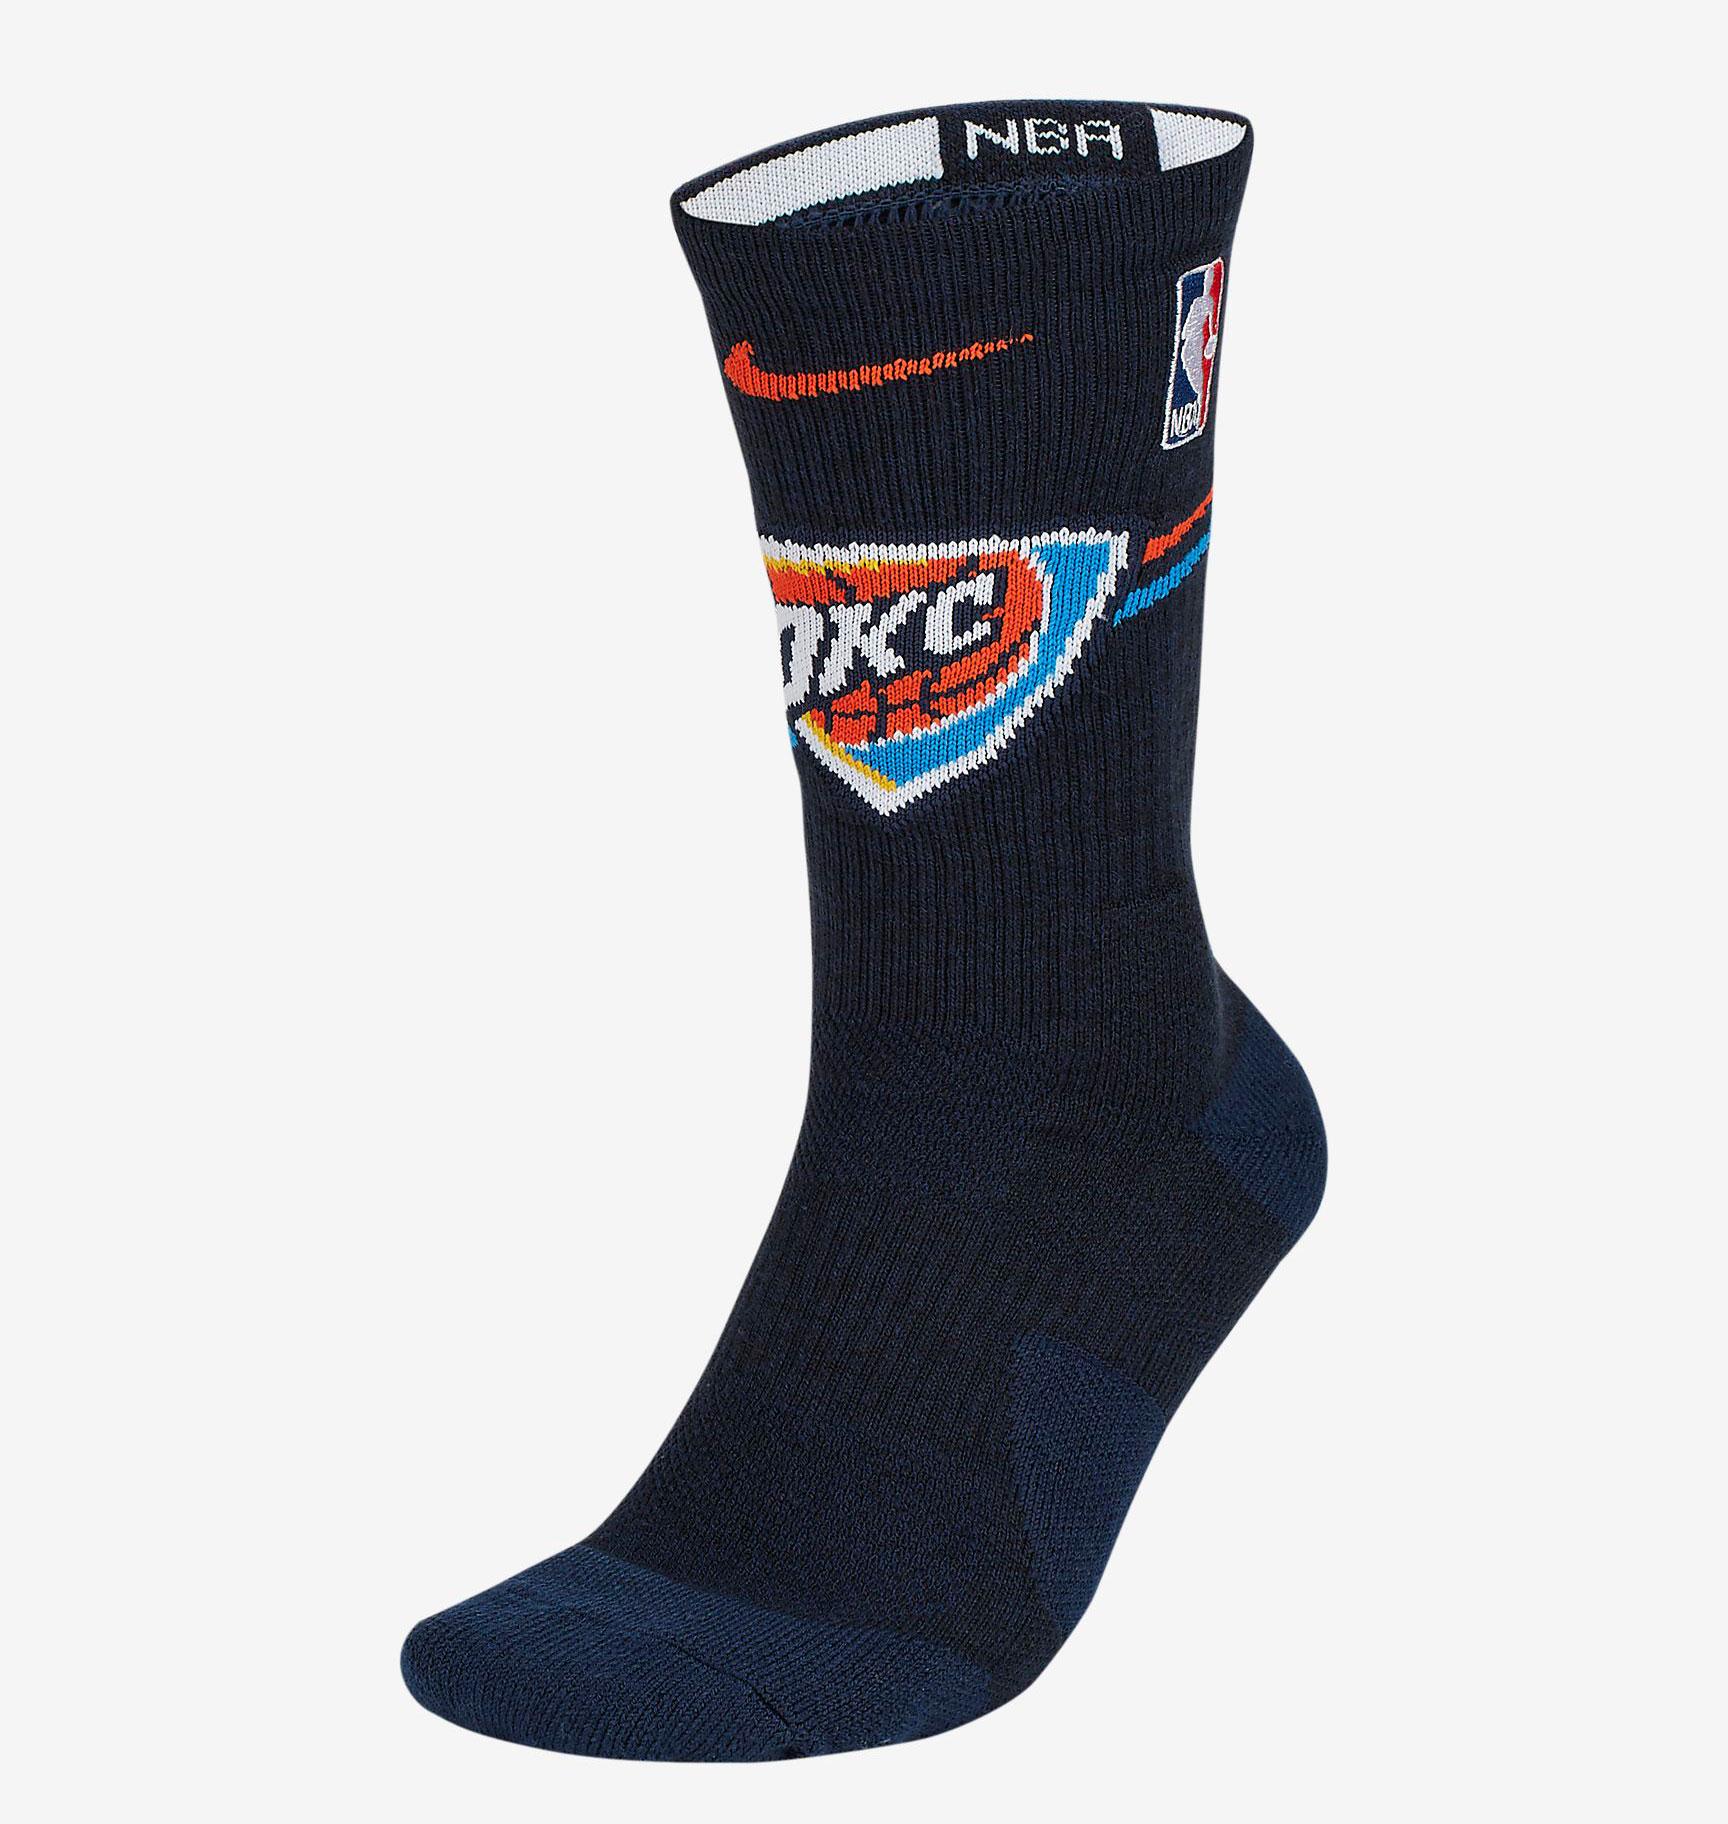 nike-air-foamposite-one-rugged-okc-thunder-socks